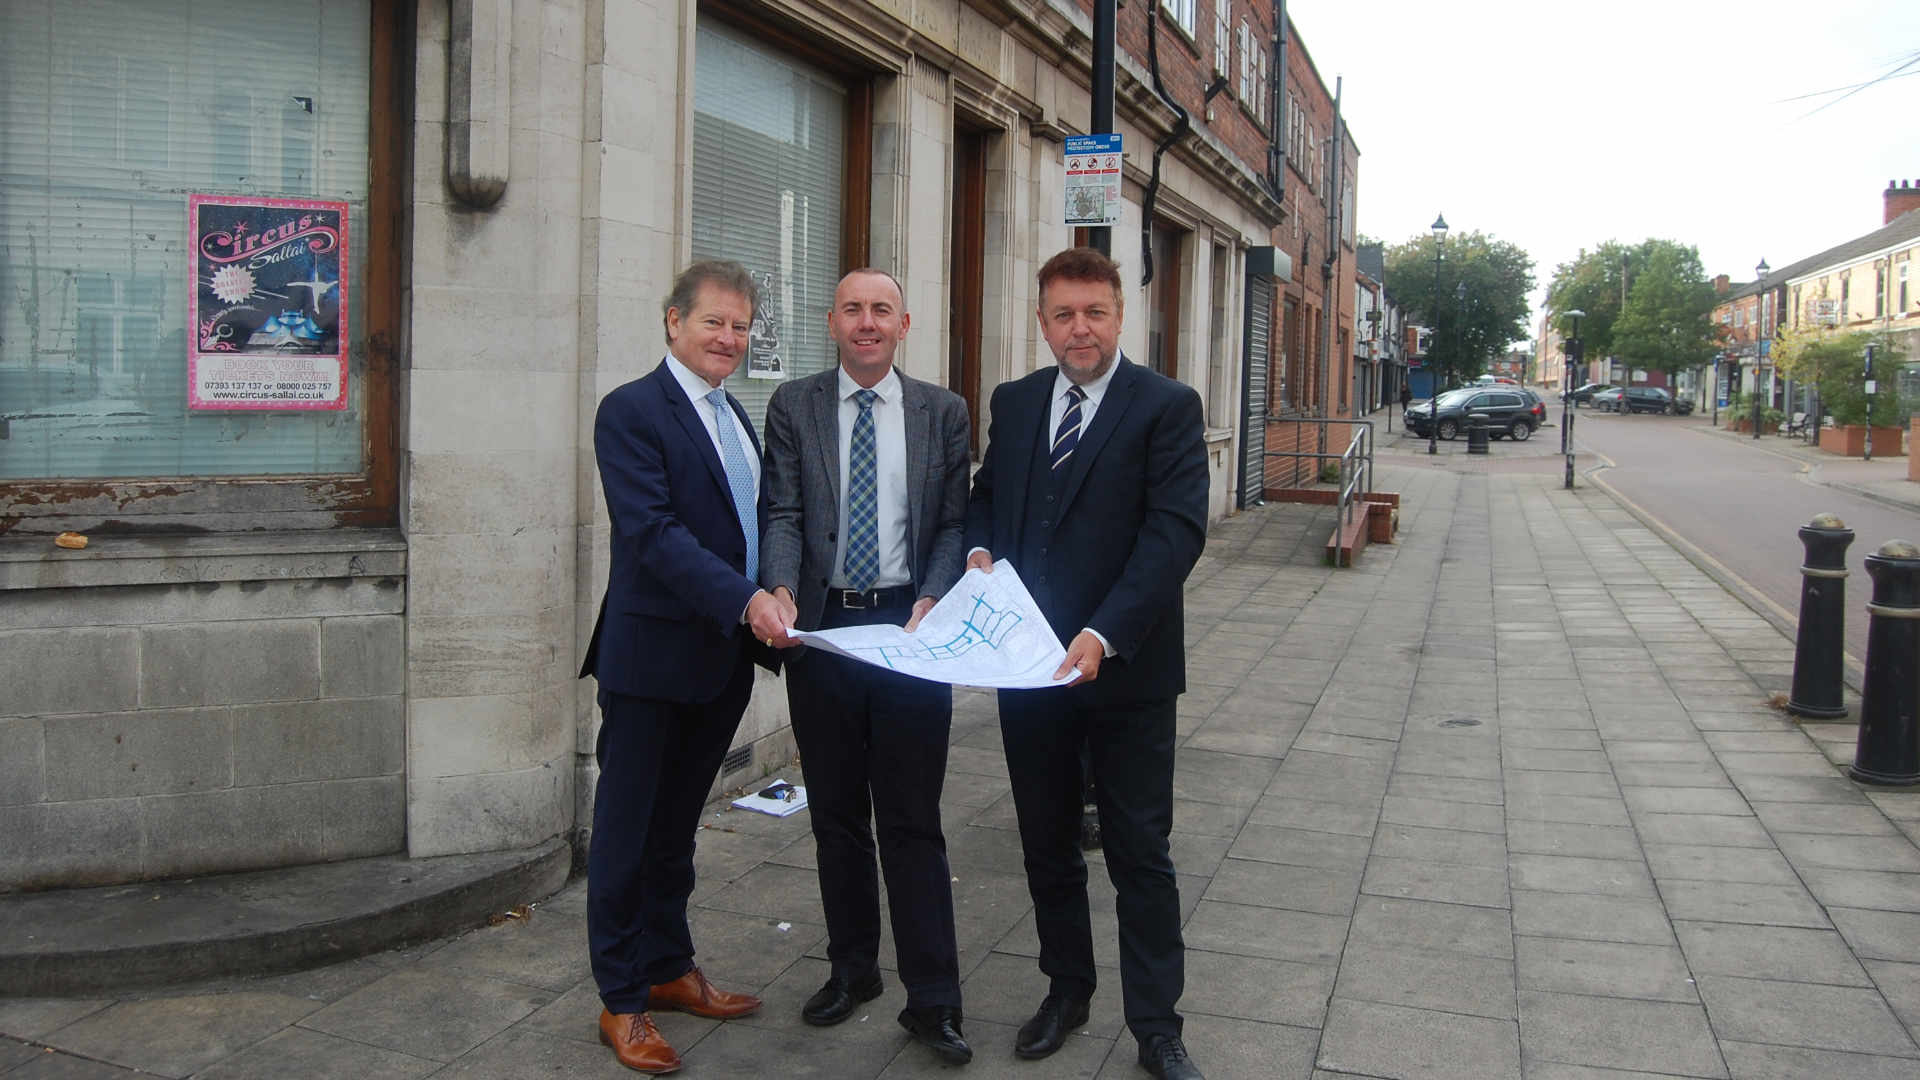 Humber High Street Challenge Fund